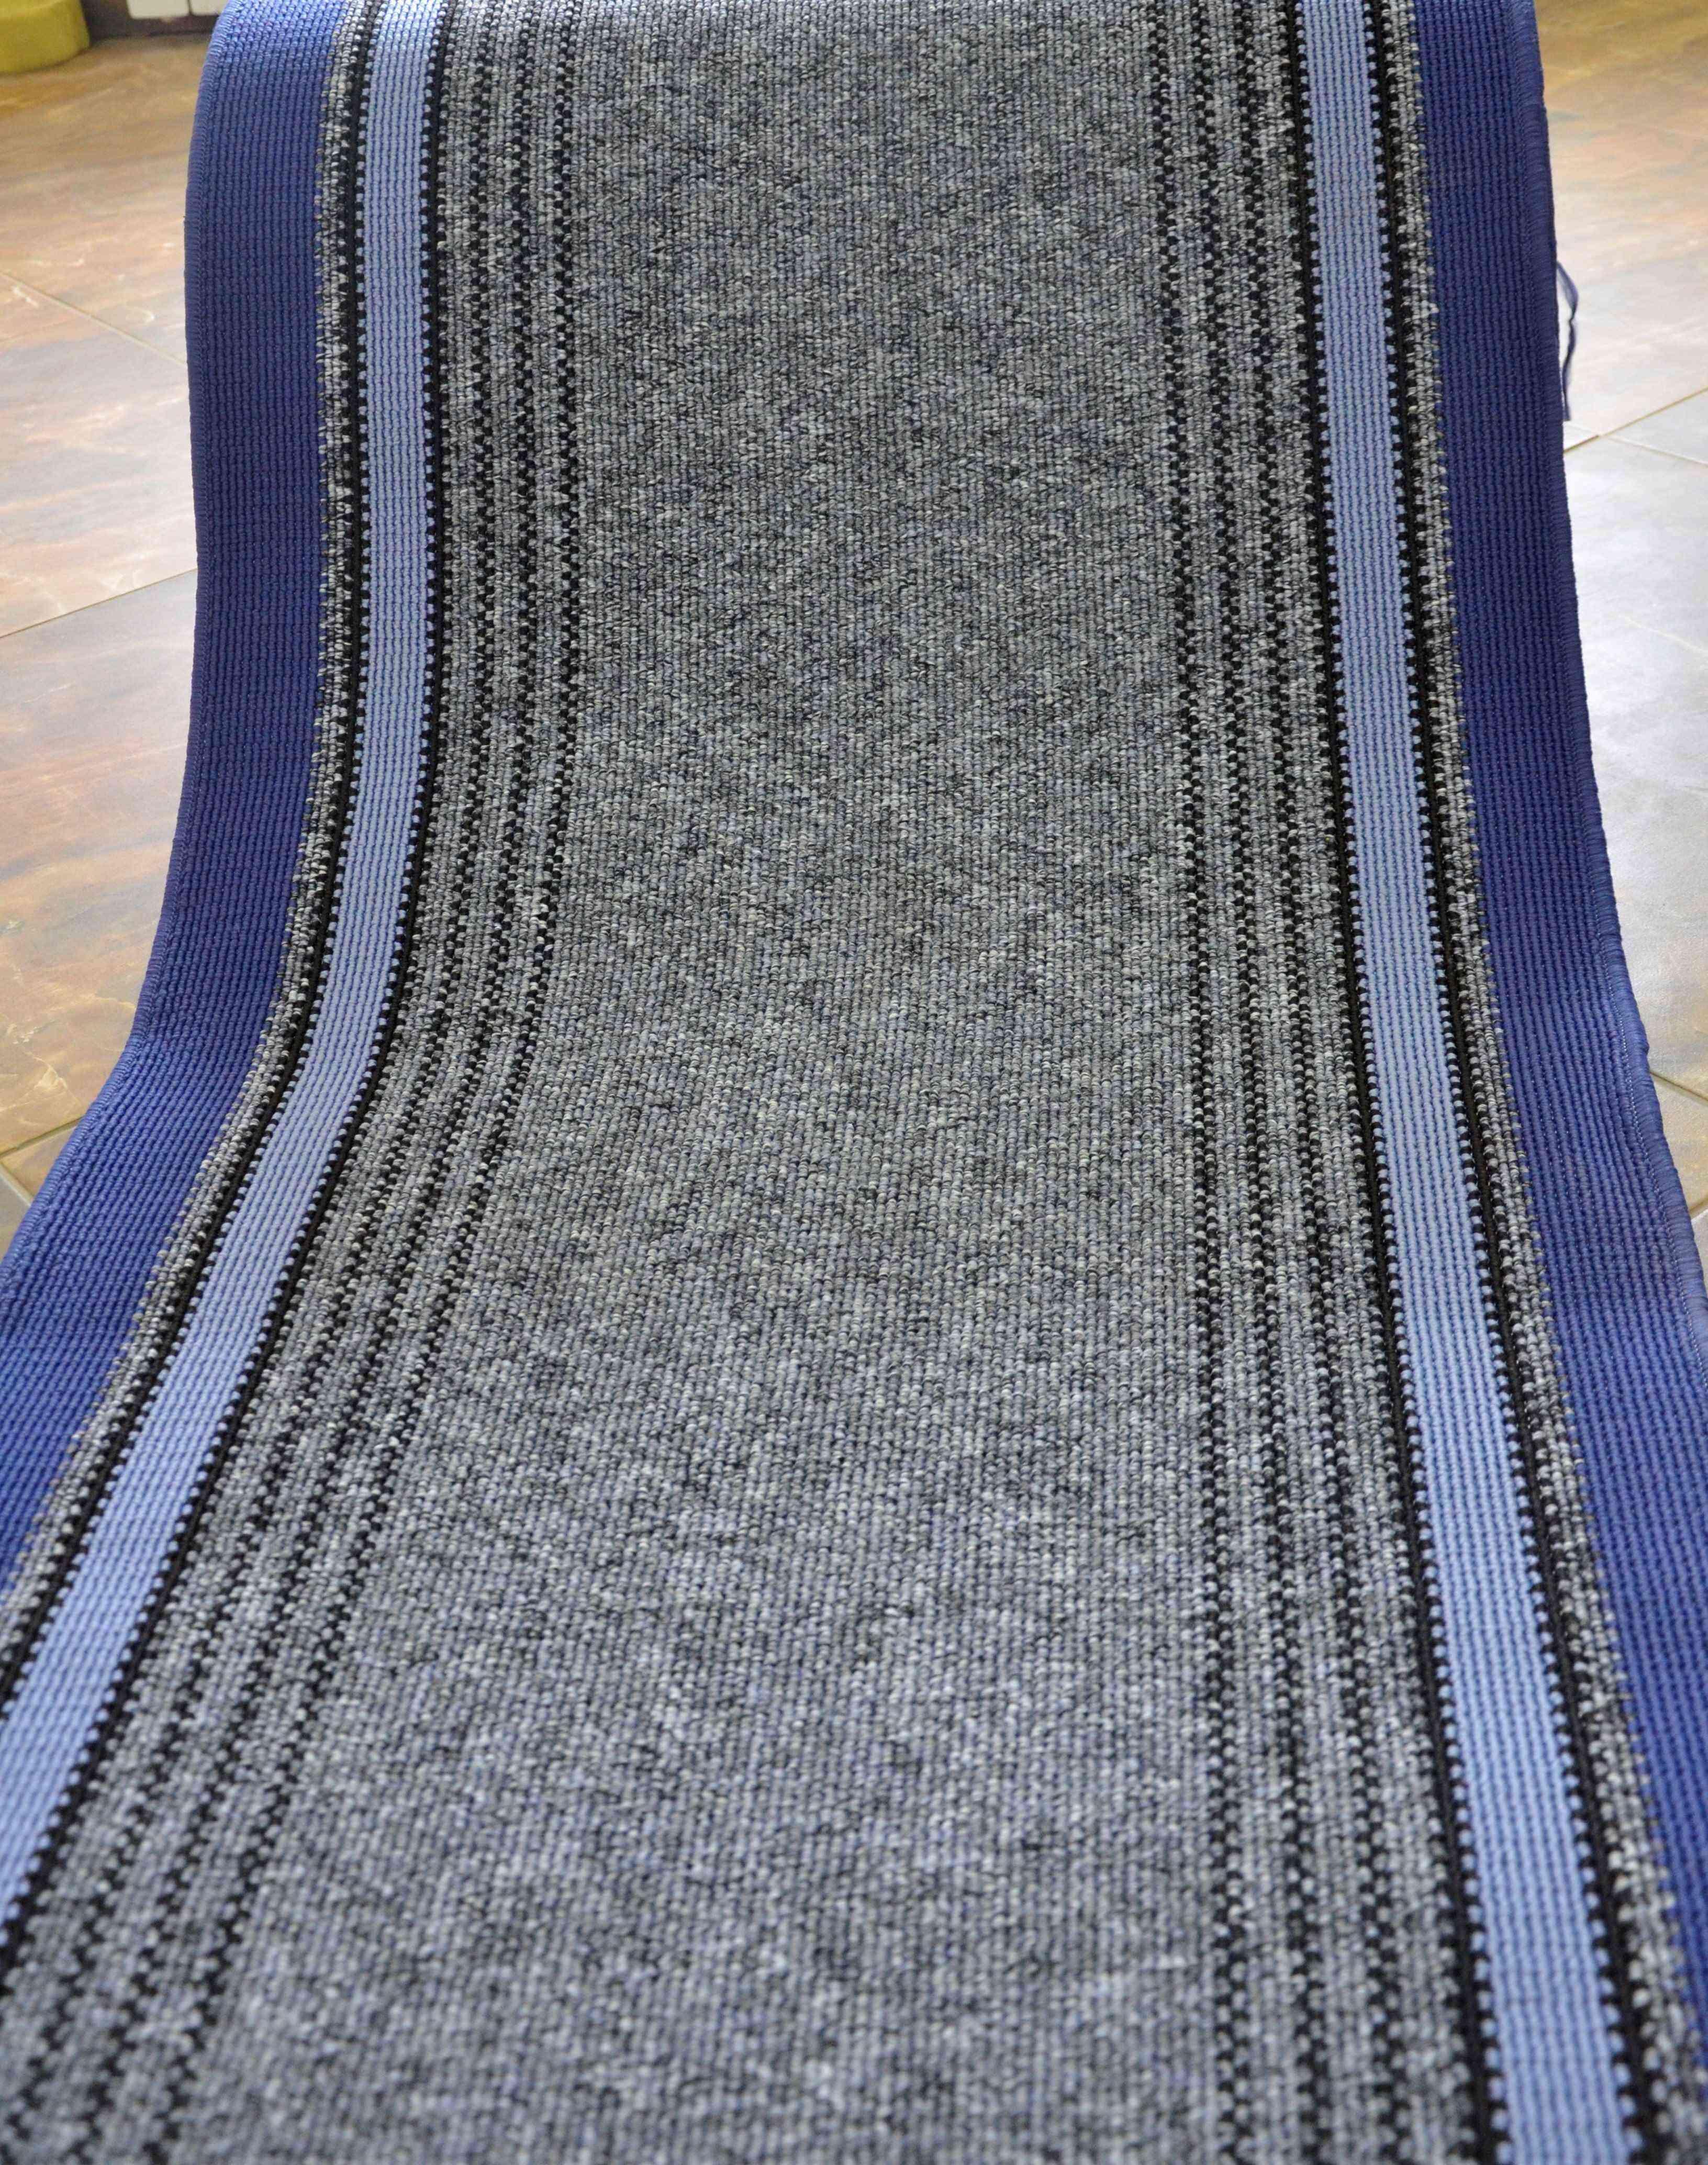 Traversa Covor, Saba 08, Albastru, 100x800 cm, 1350 gr/mp, 1x8 m 4